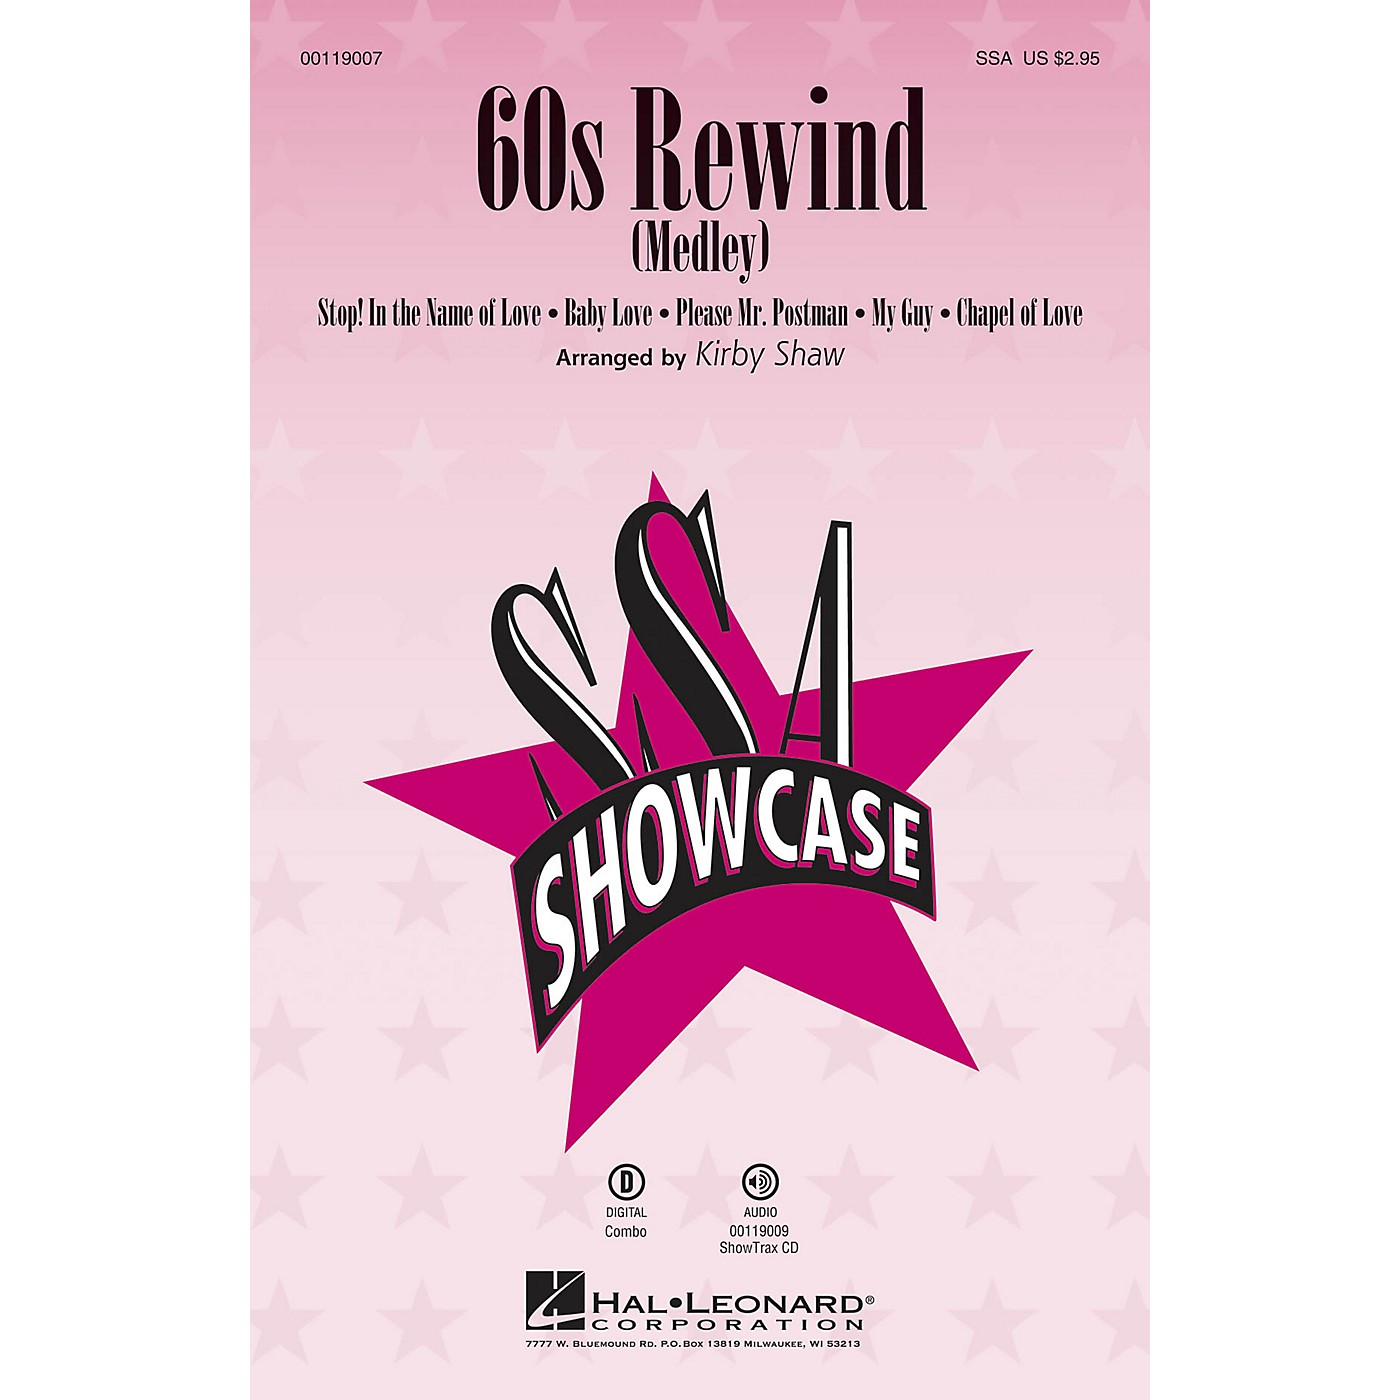 Hal Leonard 60s Rewind (Medley) (SSA) SSA arranged by Kirby Shaw thumbnail